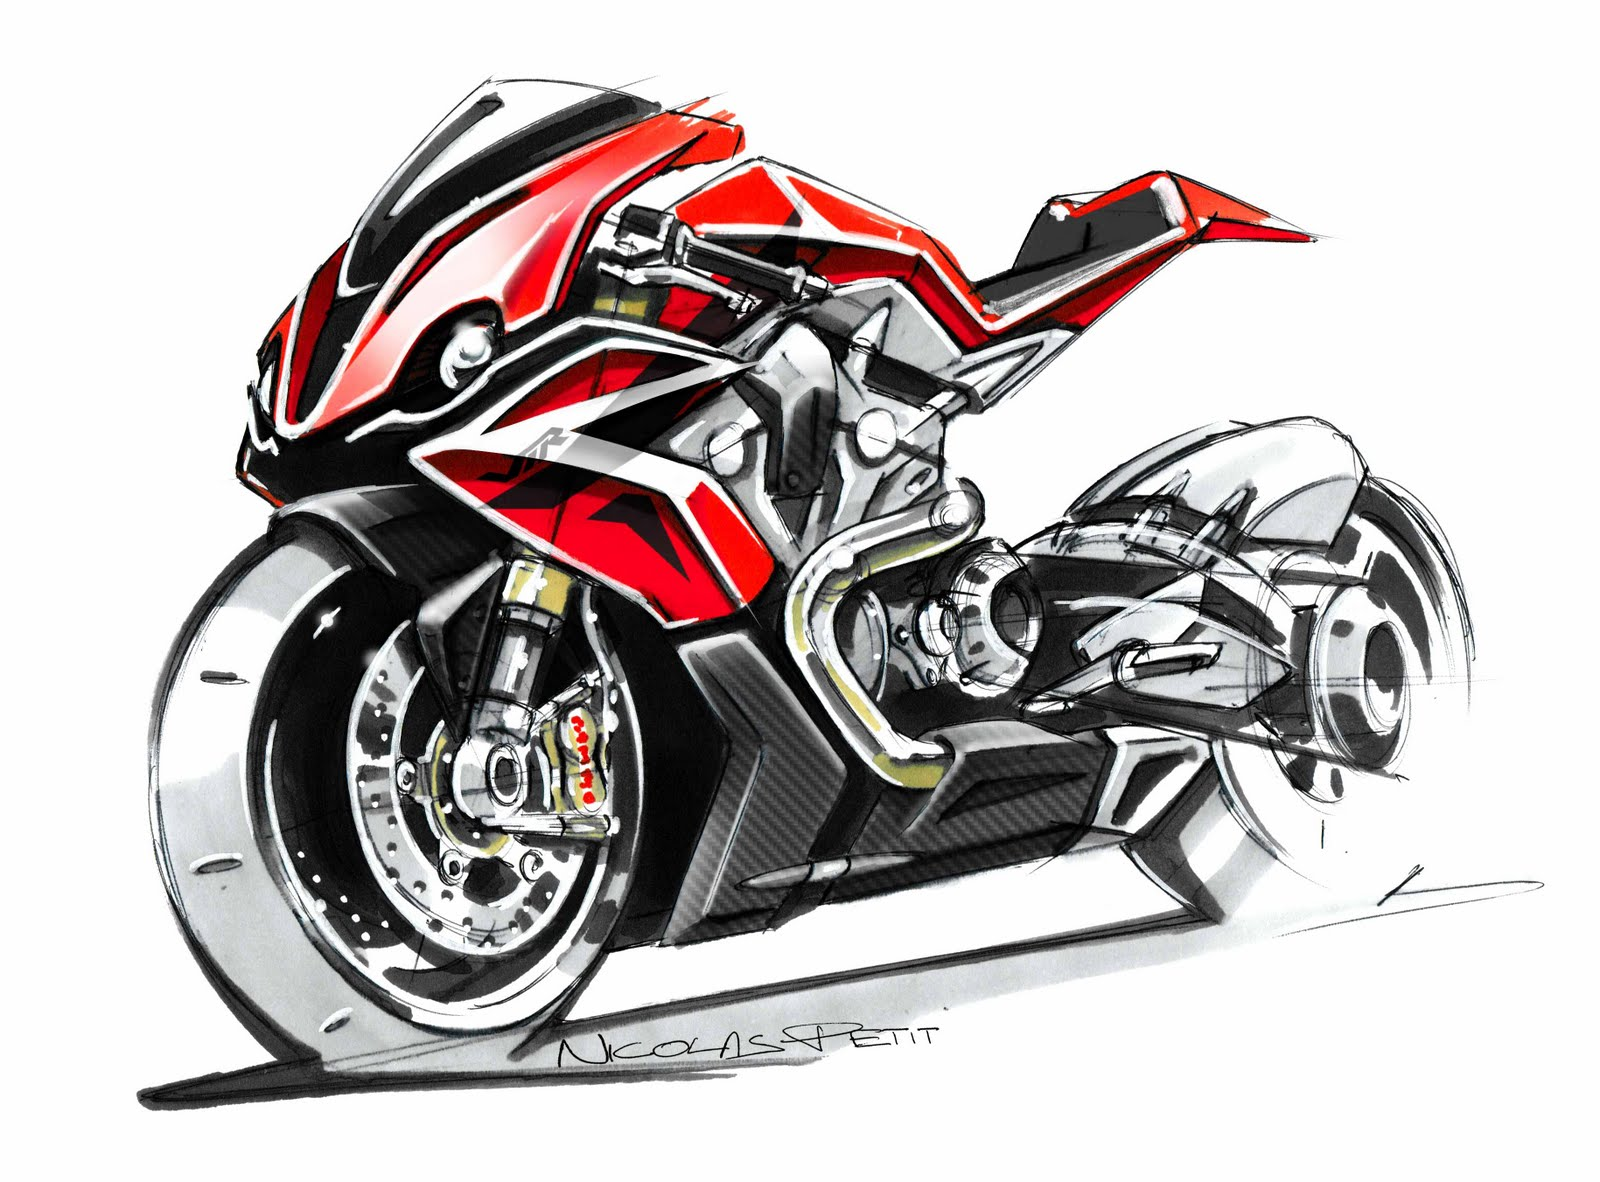 Concept/design/photomontage sur R  - Page 2 Honda%2BVTR%2B1200%2Bby%2BPetit%2BMotorcycle%2BCreation%2B01